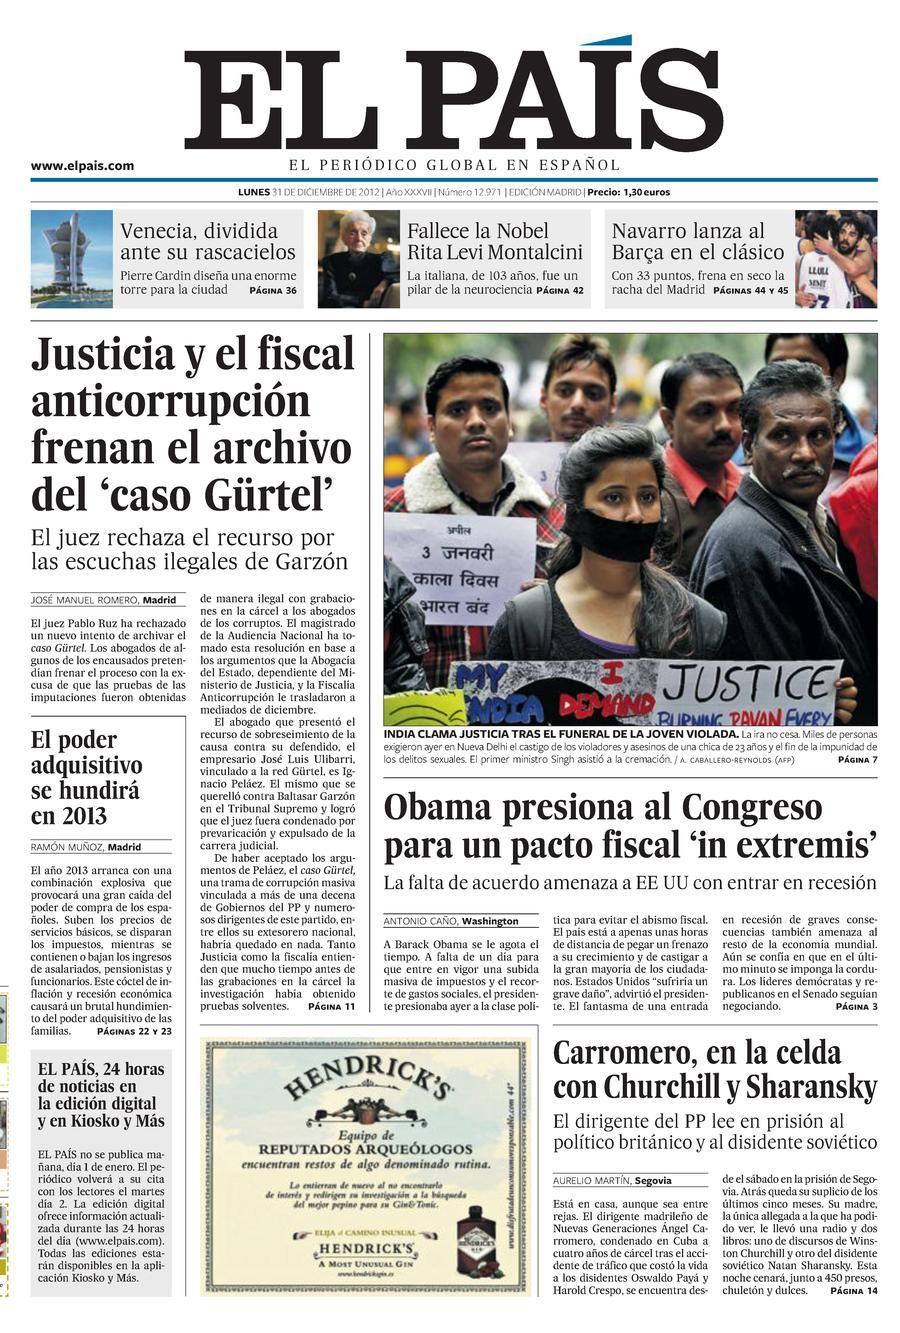 31 De Diciembre Aniversario El País Programa De Actividades Paises Diciembre